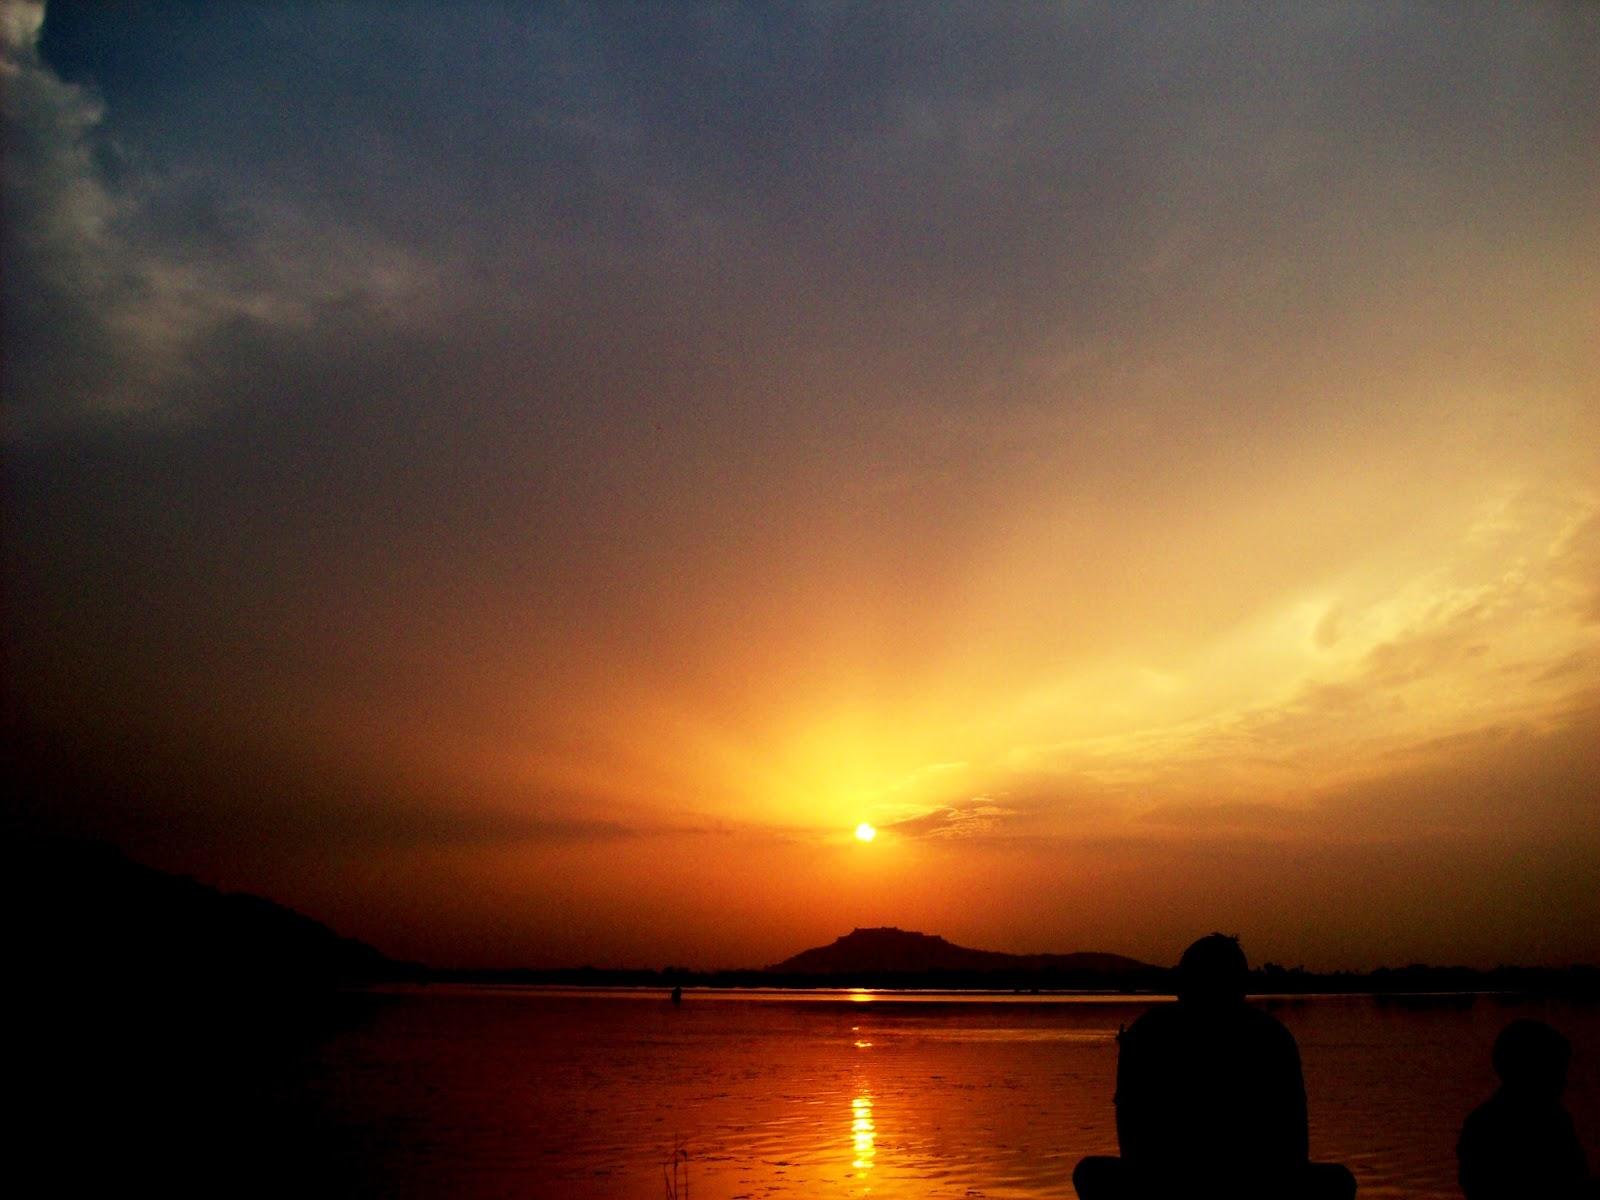 CHINAR SHADE : A QUATRAIN IN KASHMIRI AND A SUNSET VIEW OF DAL LAKE ...